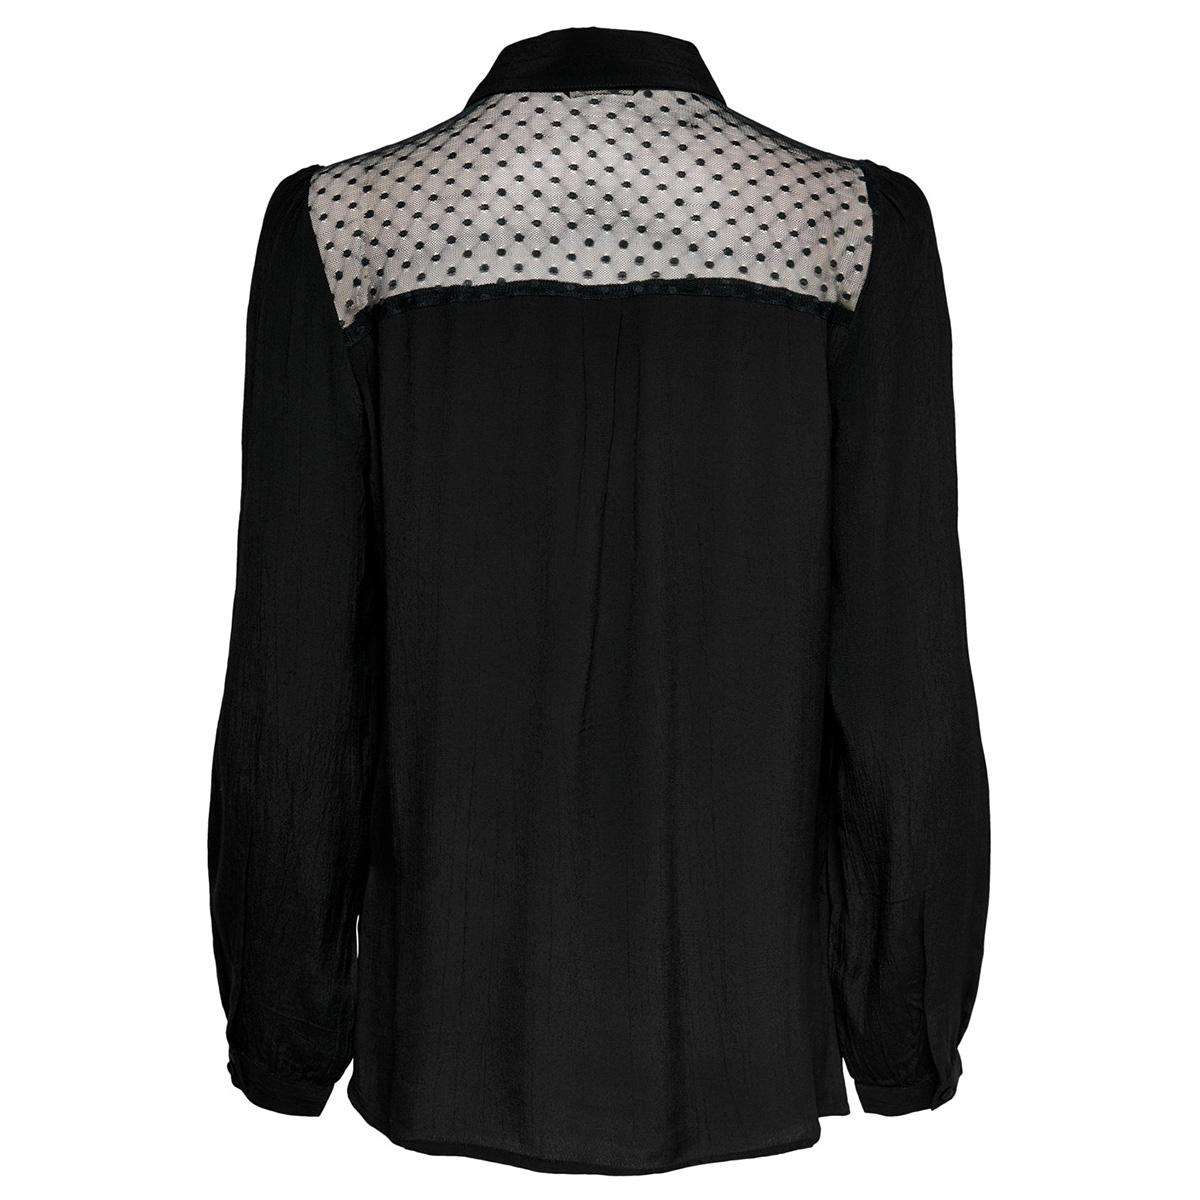 onldoris l/s top wvn 15192234 only blouse black